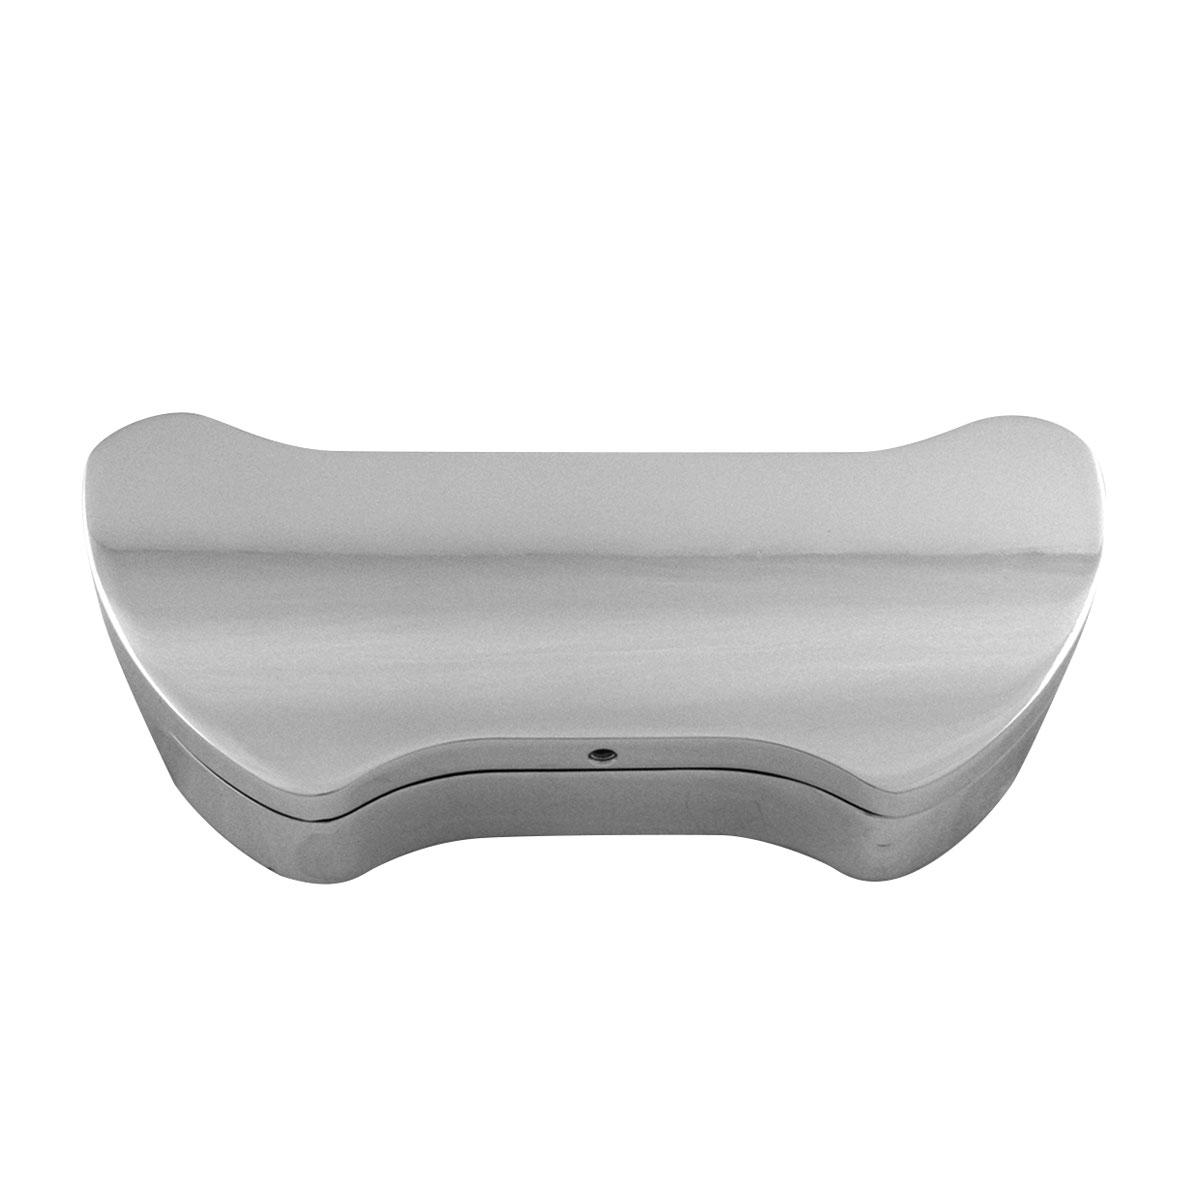 V-Twin Manufacturing Chrome Top Handlebar Clamp